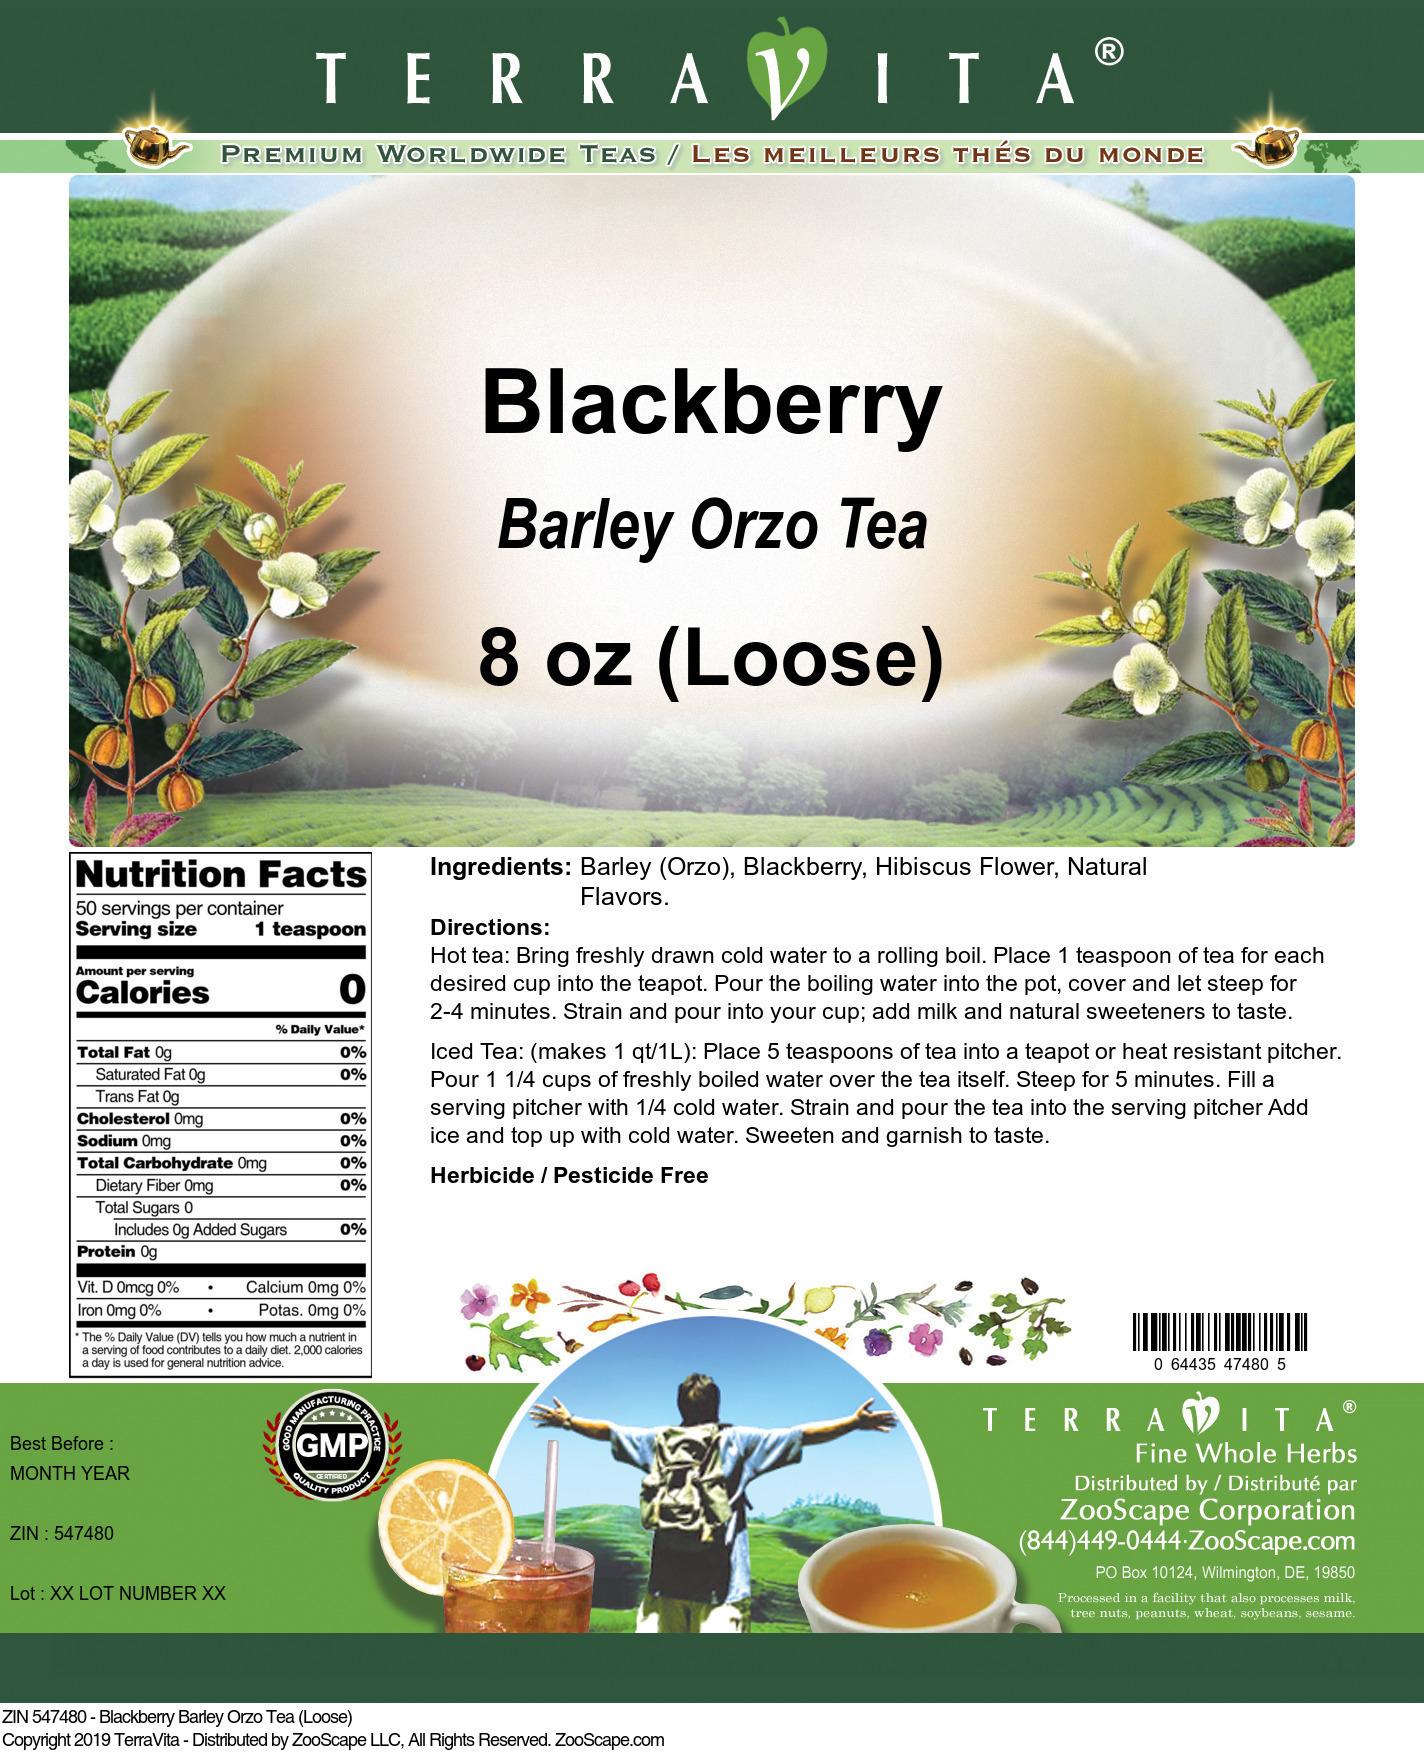 Blackberry Barley Orzo Tea (Loose)